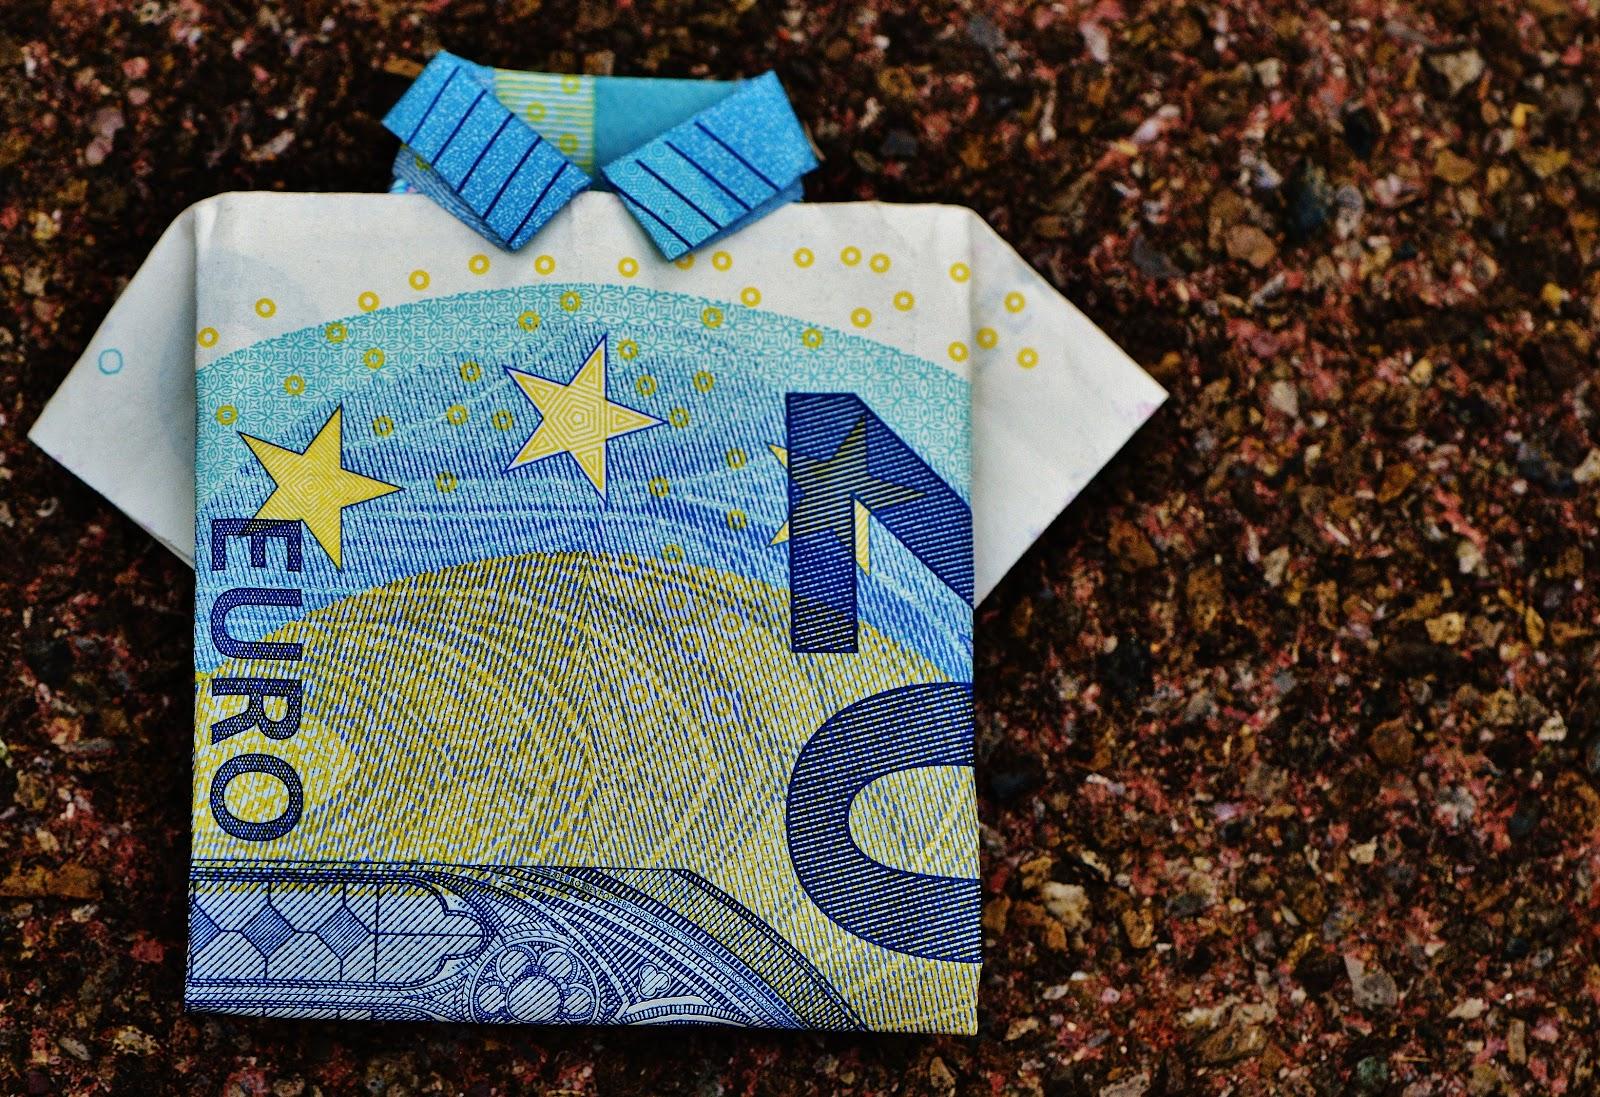 a Twenty Euro bill design polo shirt with pebbles as background.